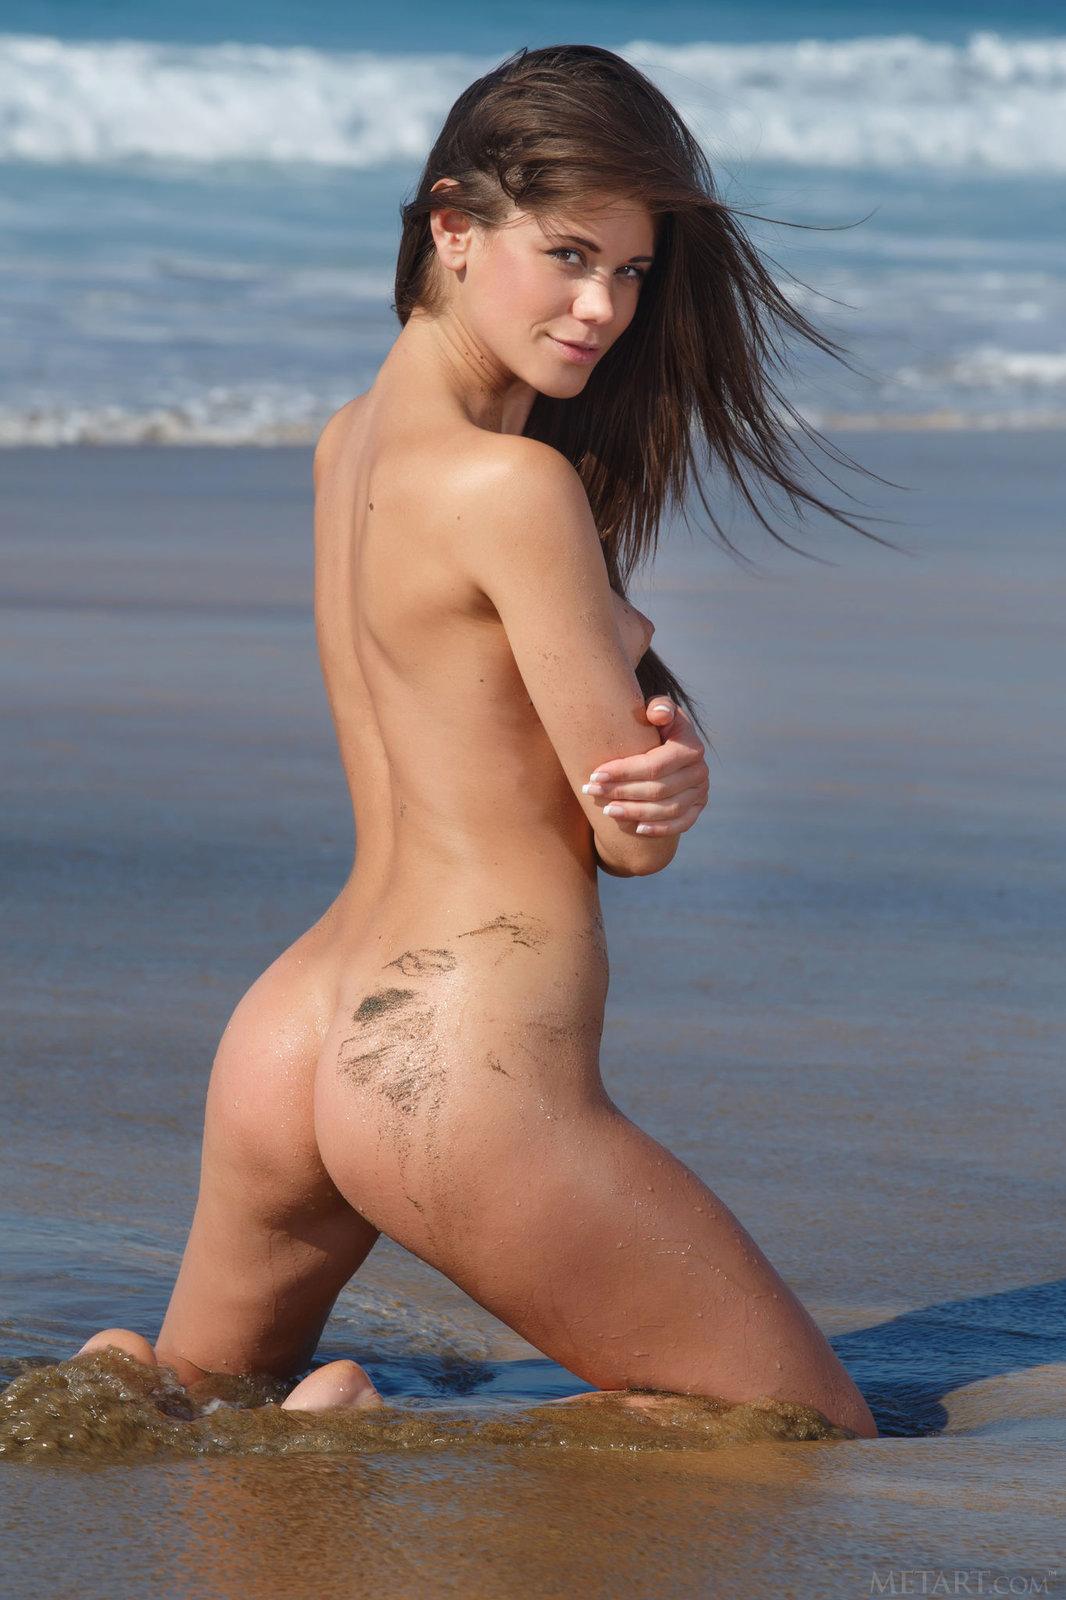 Zdjęcie porno - 1023 - Mokra brunetka